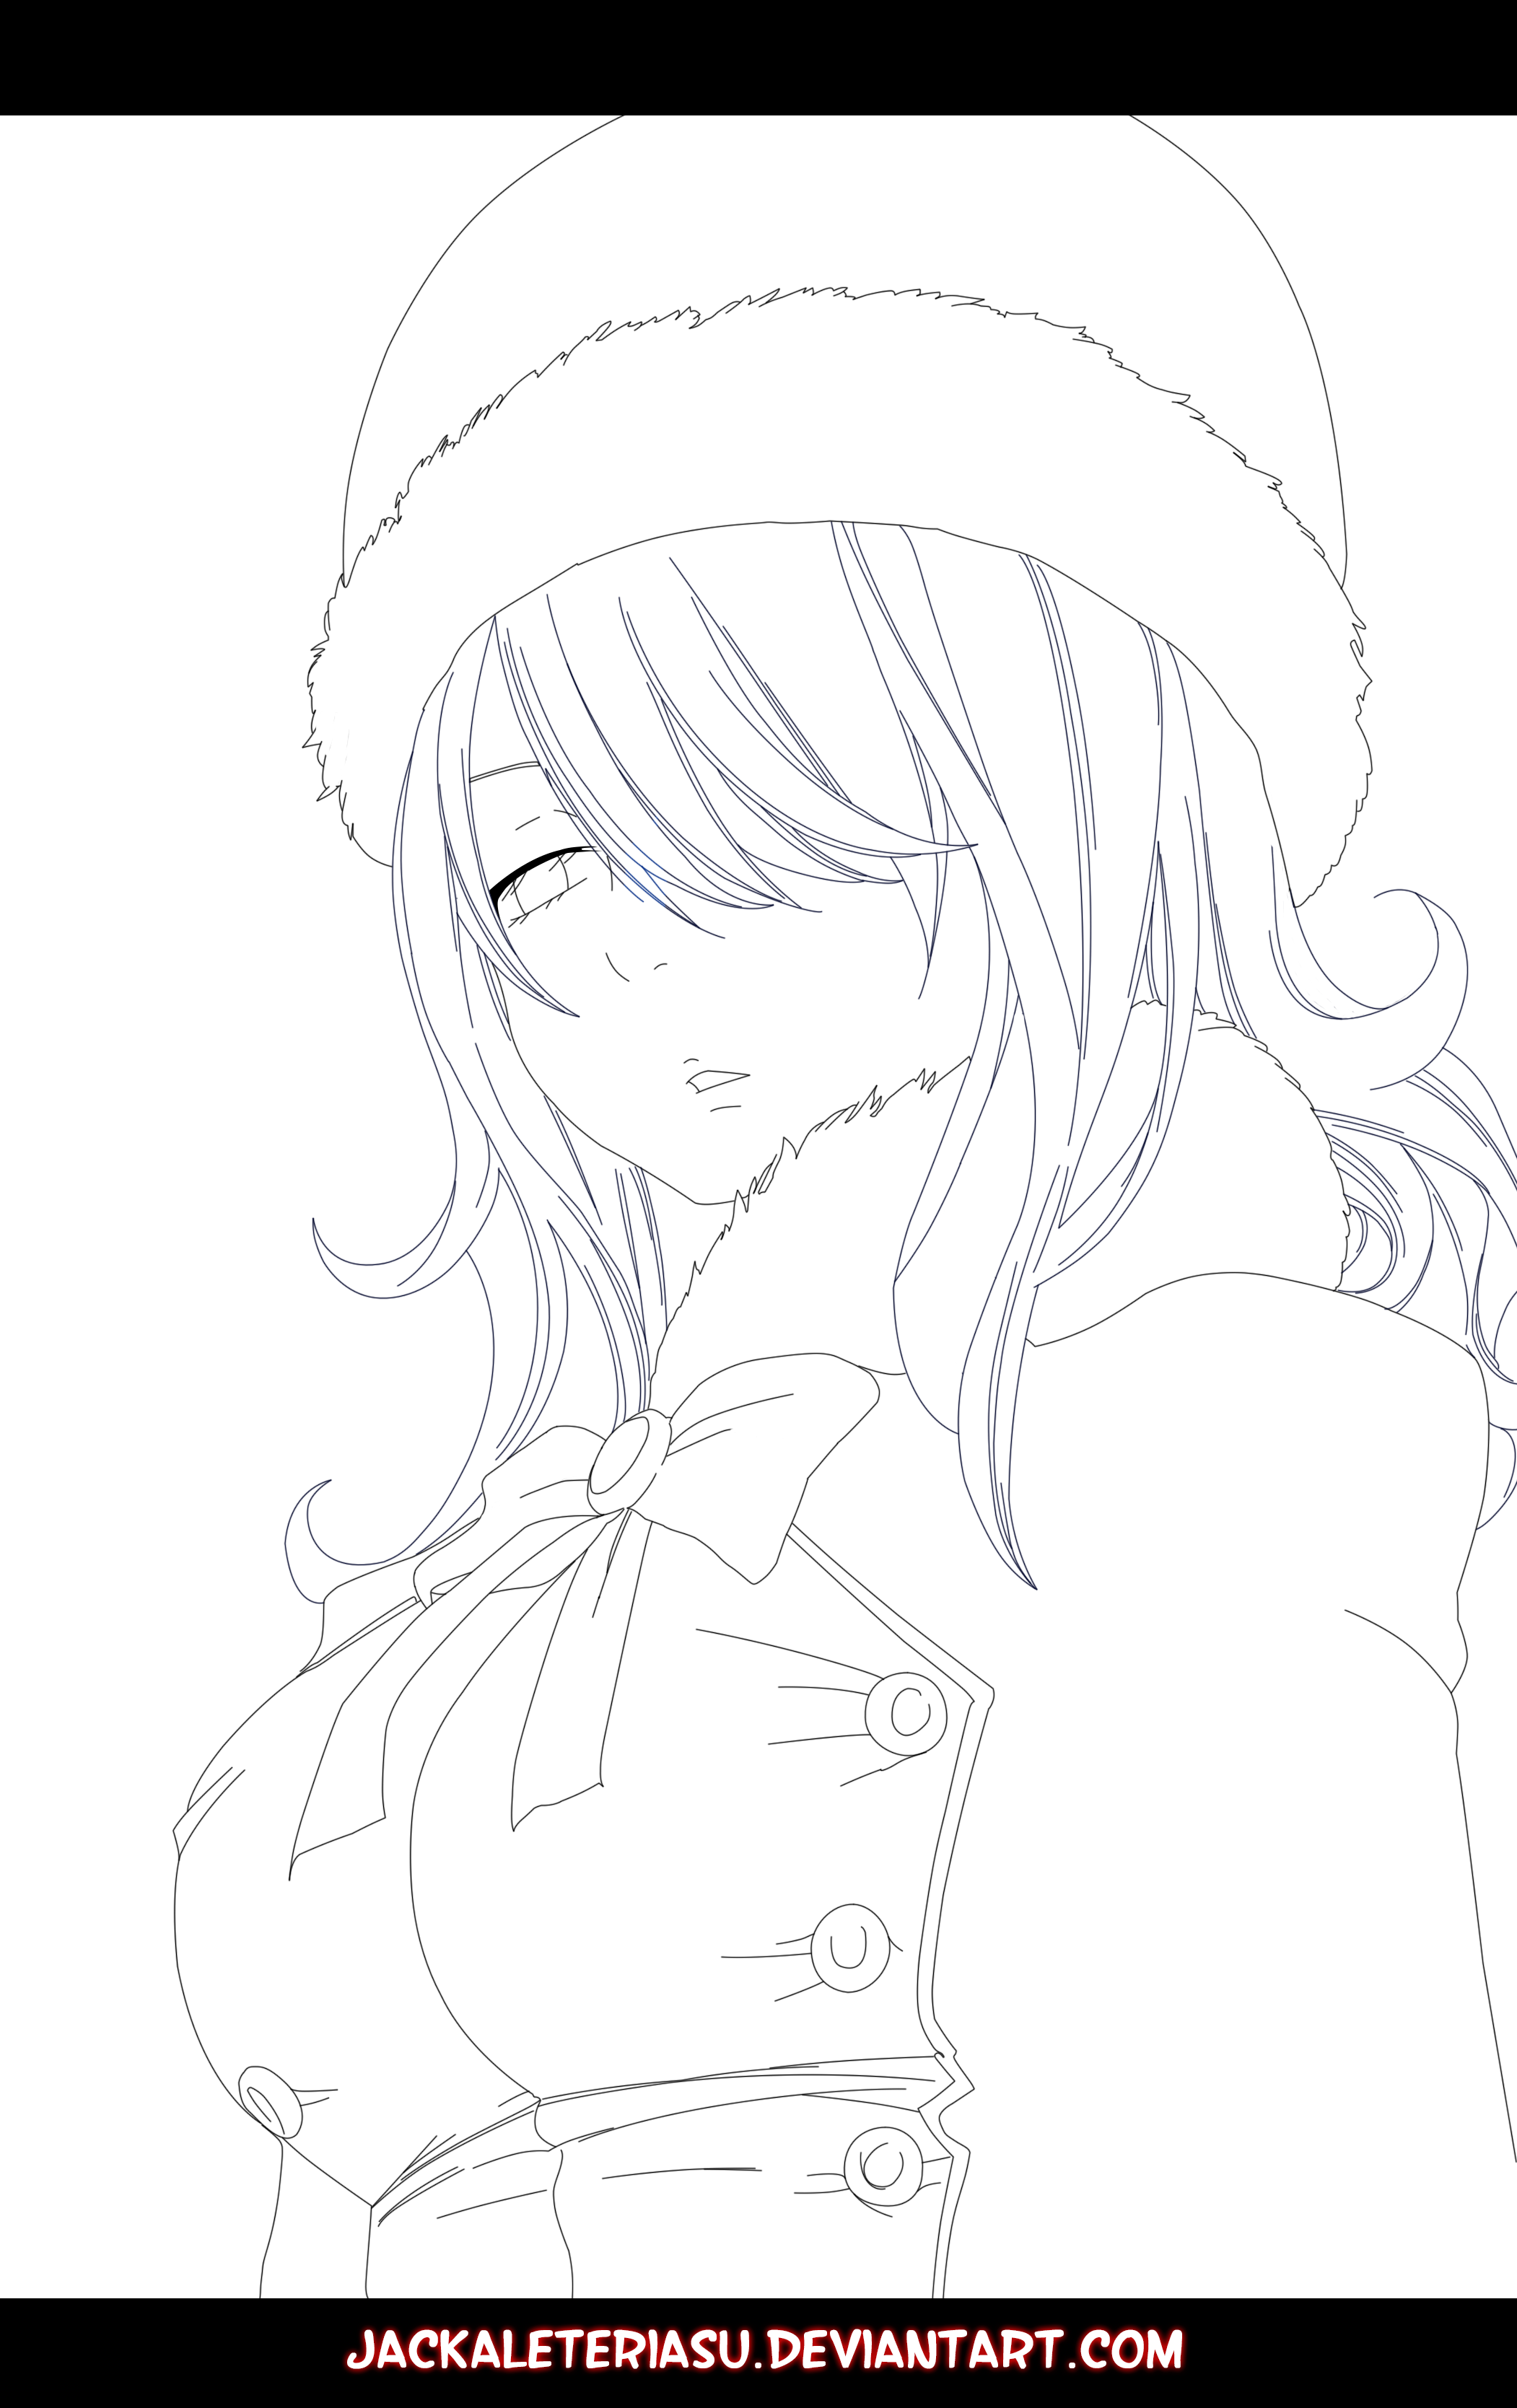 Juvia Lineart : Fairy tail juvia lineart by jackaleteriasu on deviantart